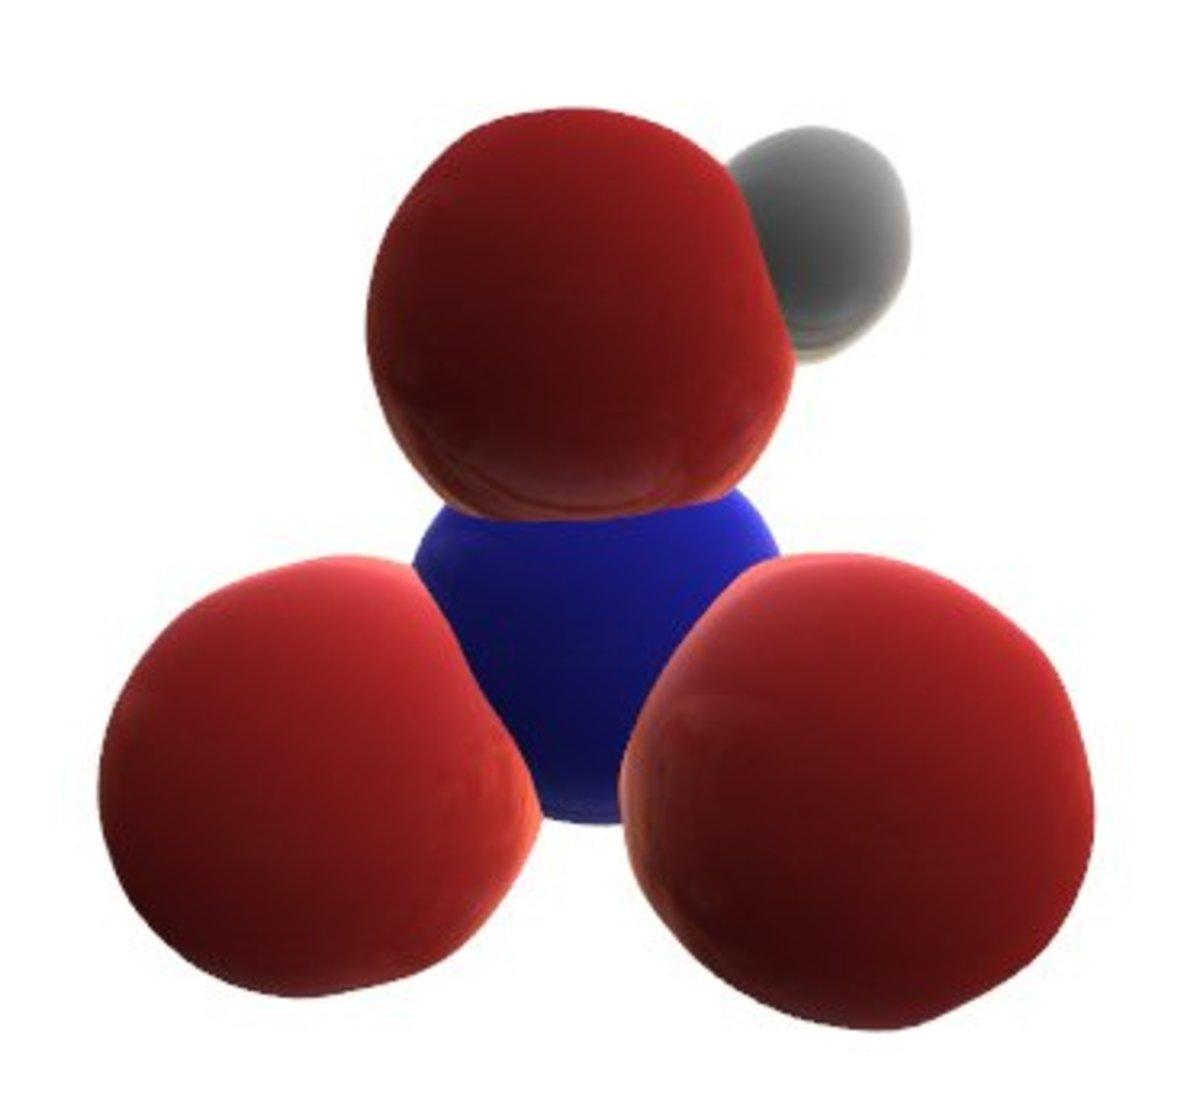 3D molecular model of nitric acid